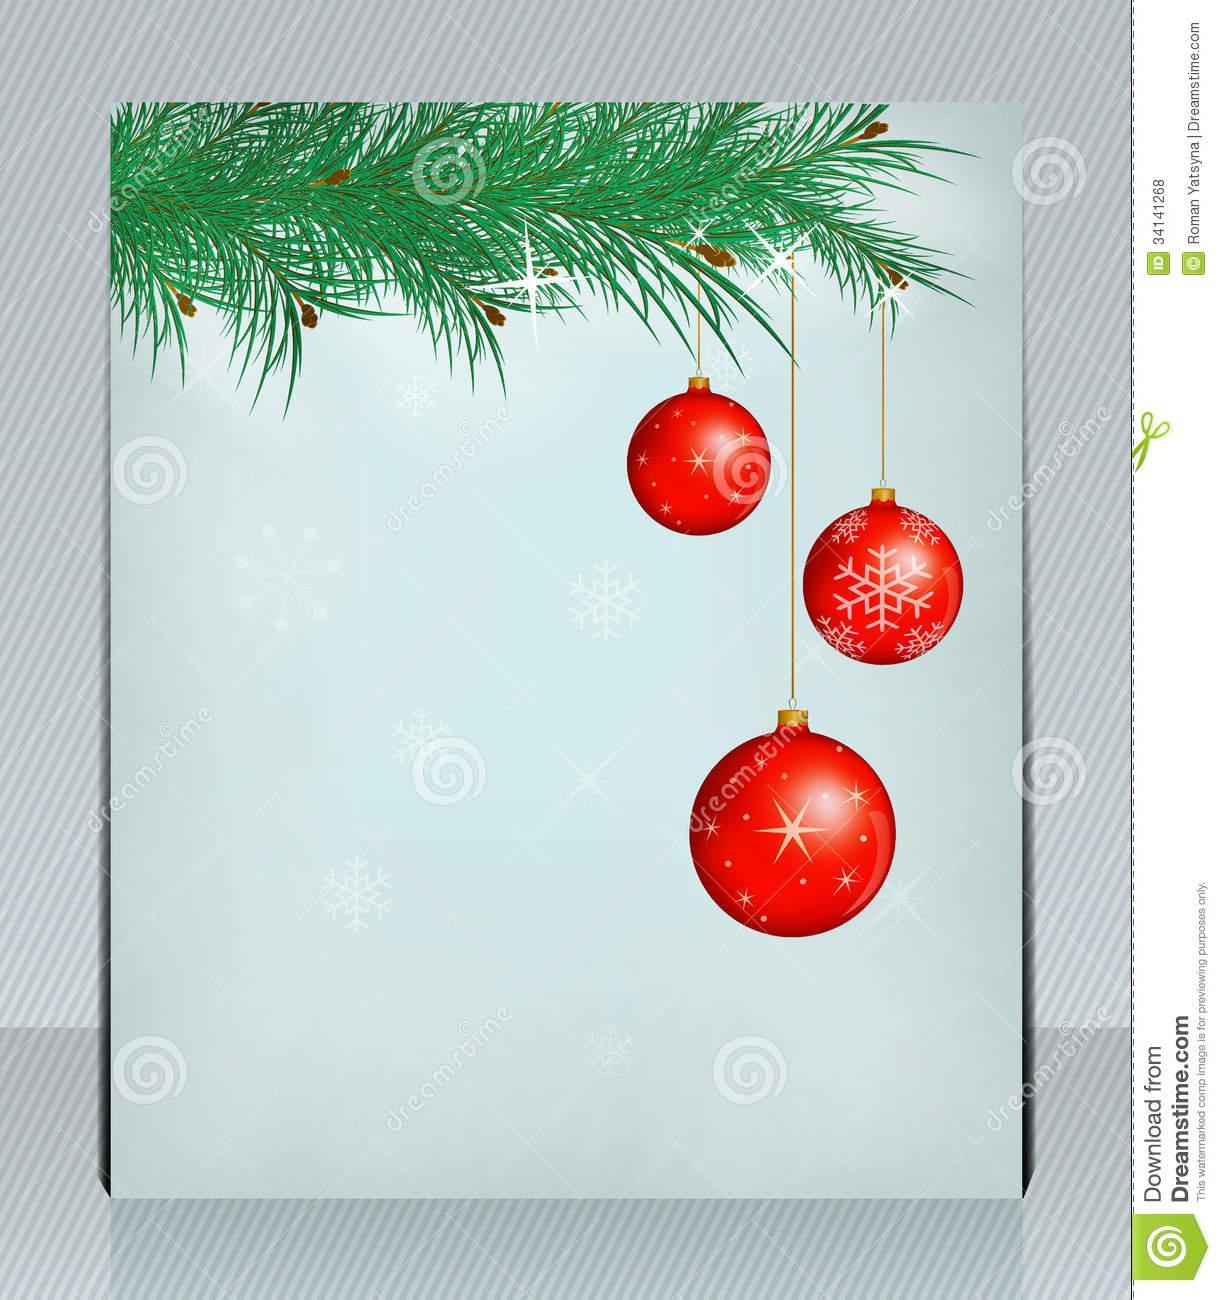 Free Printable Holiday Flyer Templates